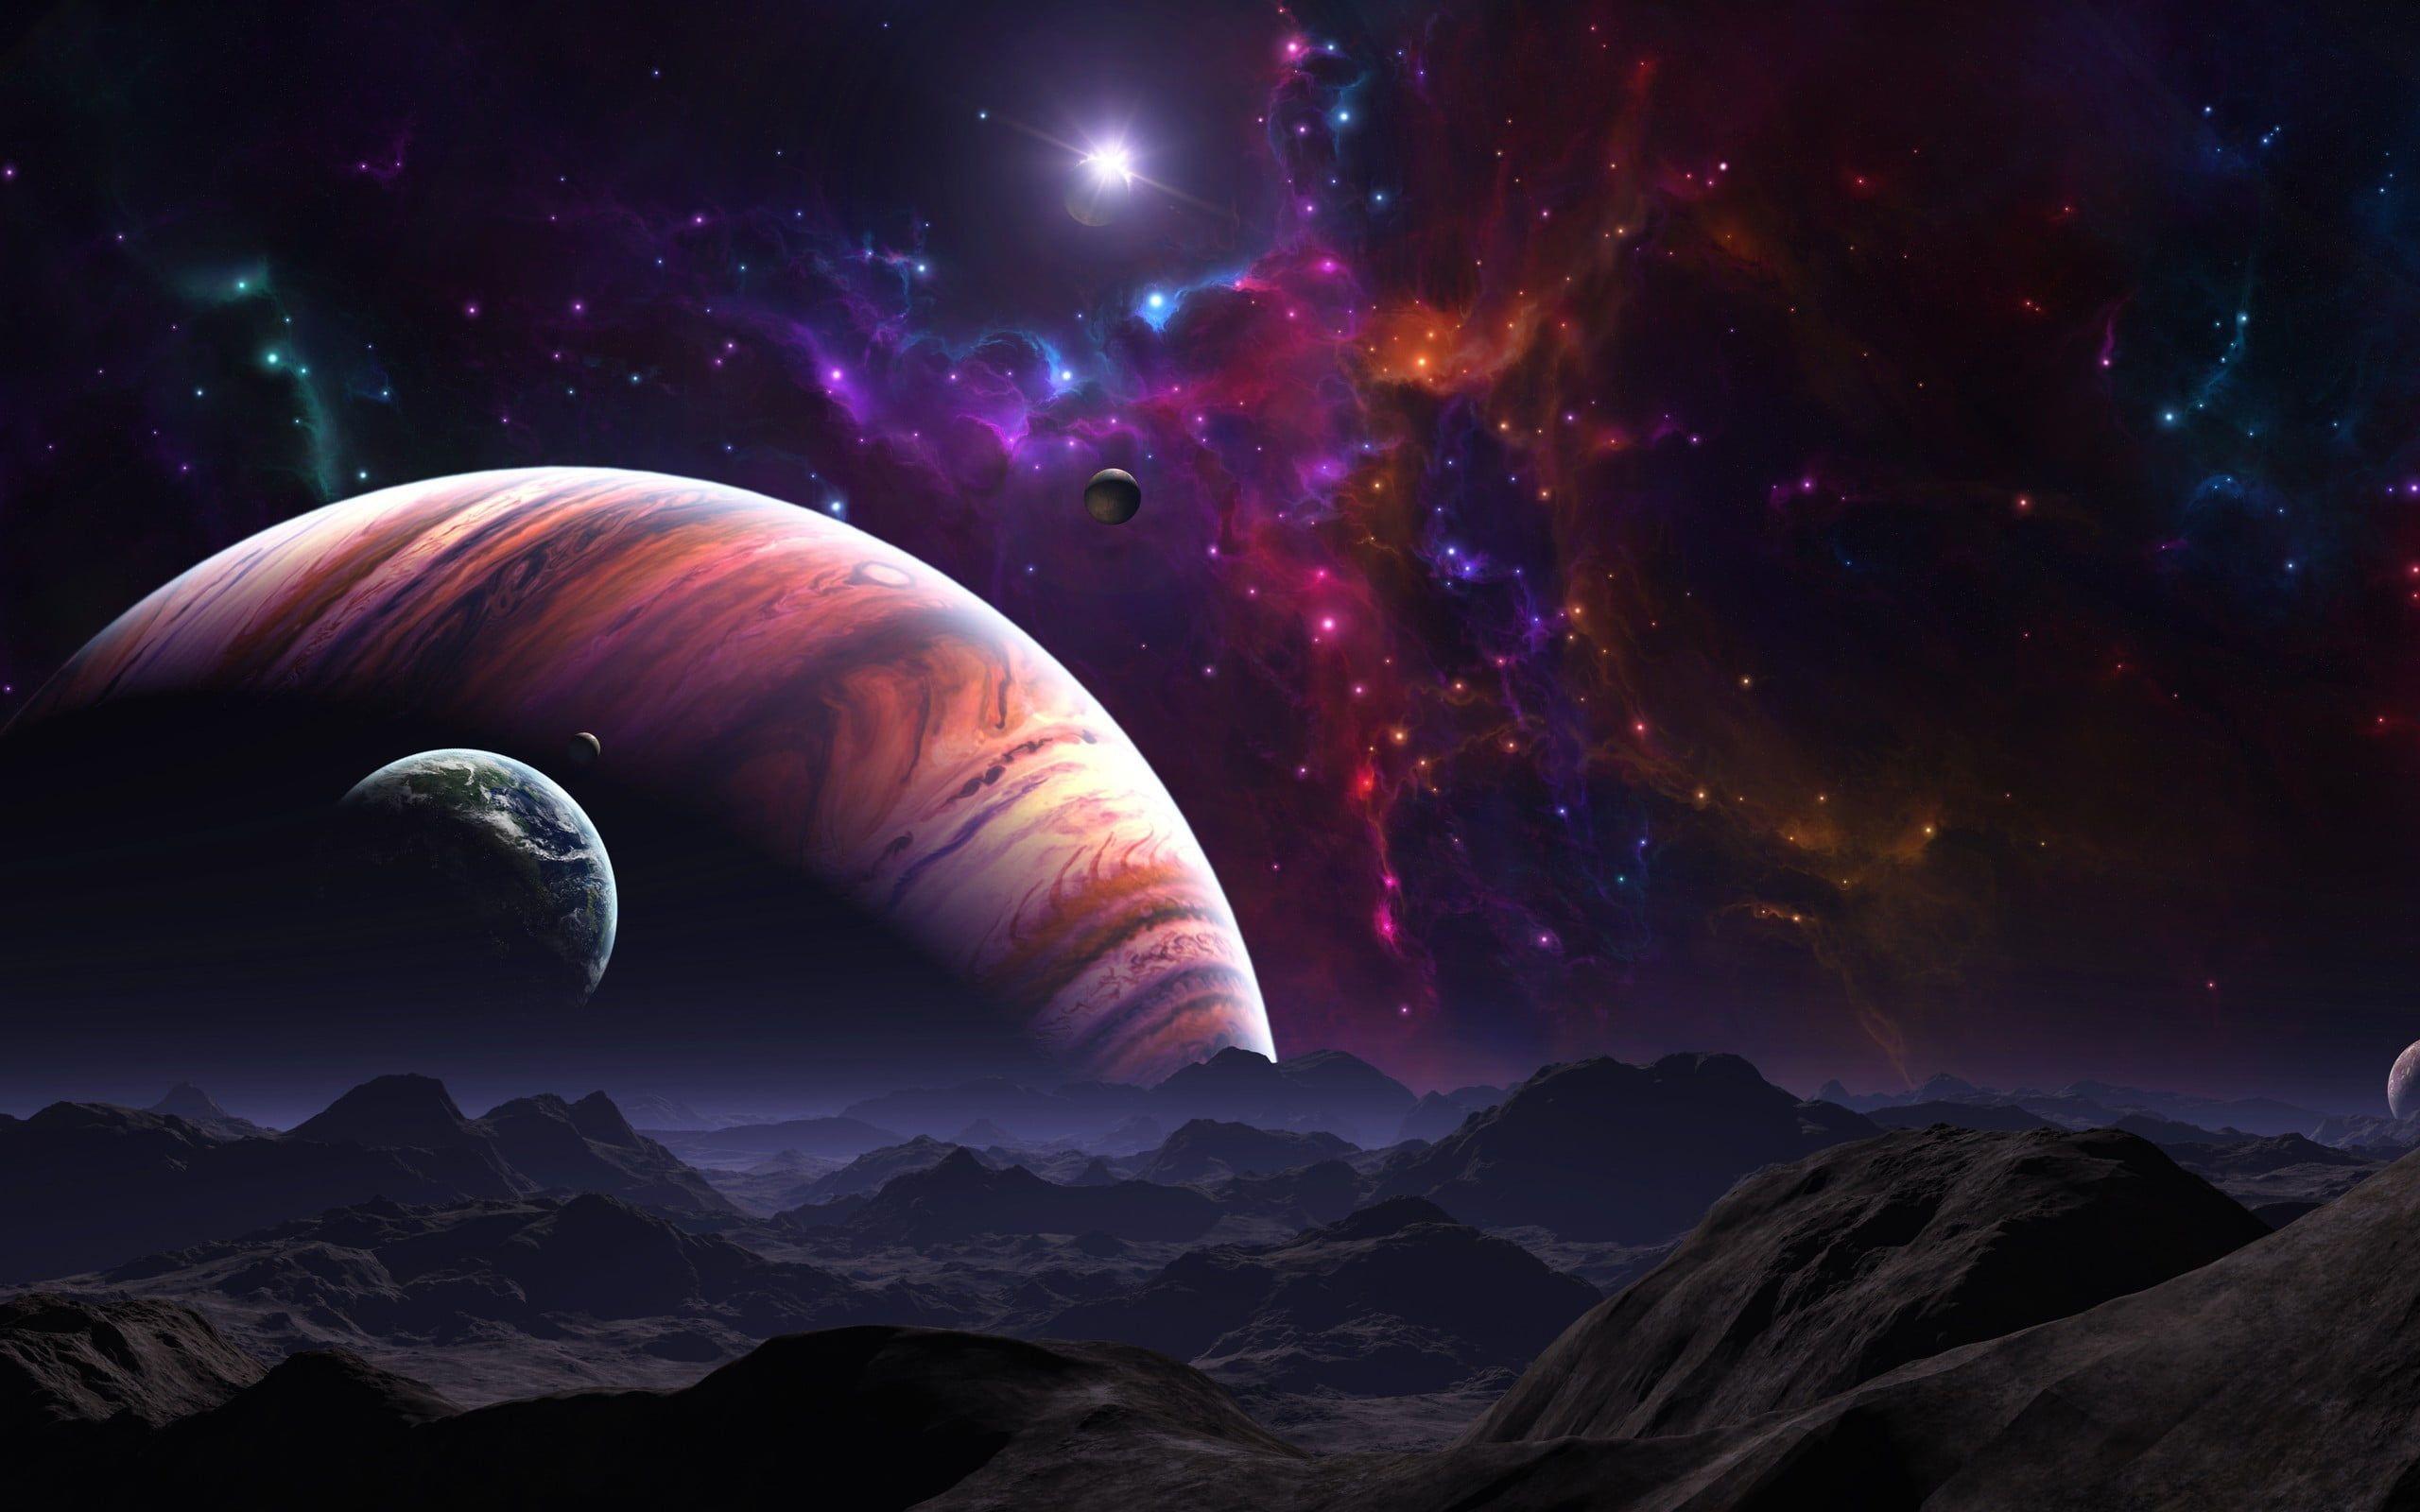 Wallpaper Universe And Planet Wallpaper Landscape Science Fiction Fantasy Art Planets Wallpaper Wallpaper Space Landscape Wallpaper